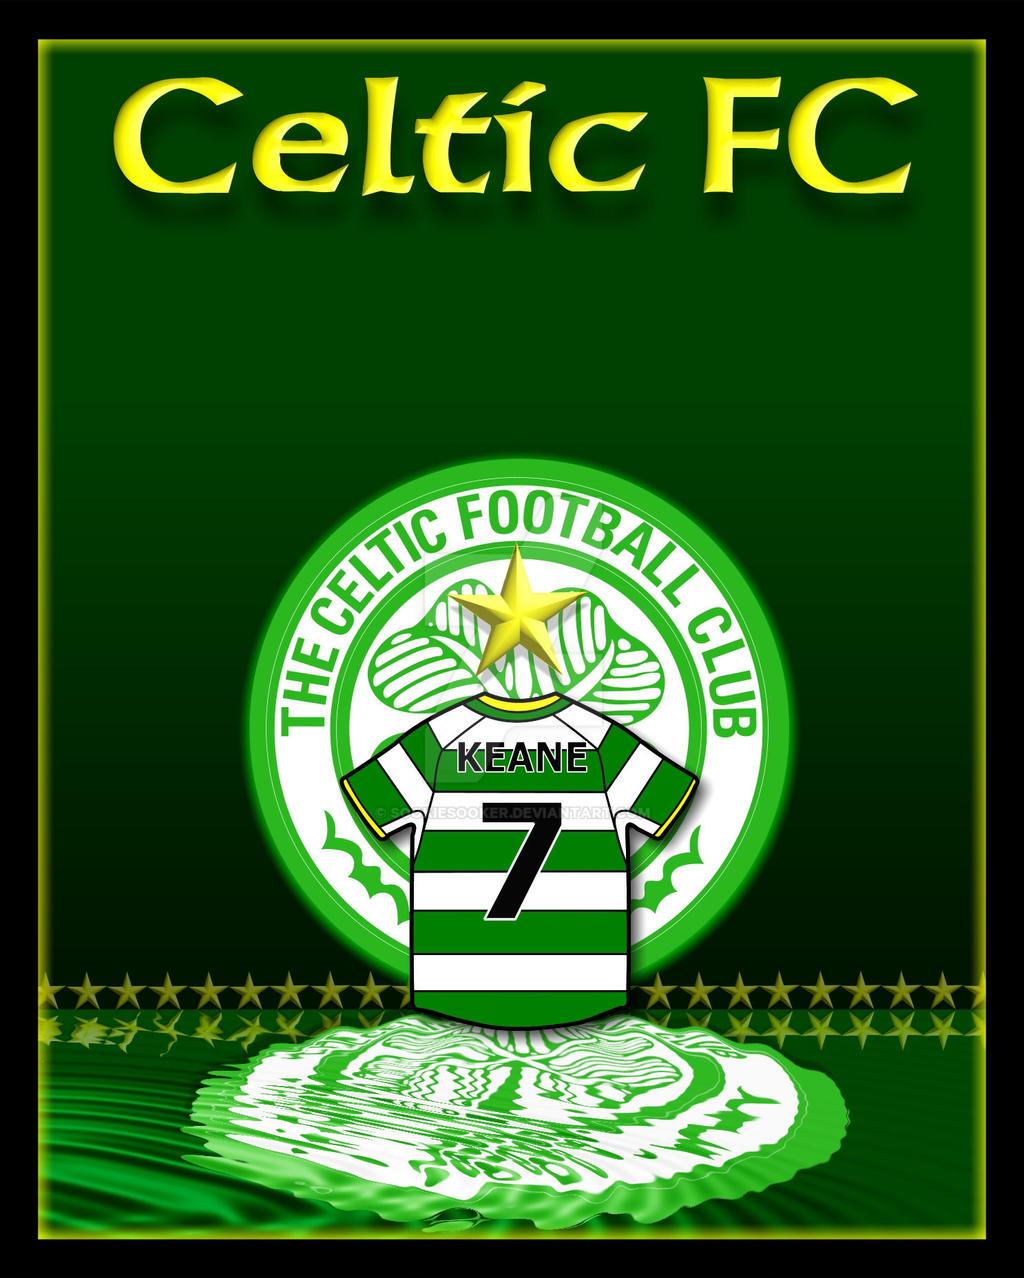 celtic fc - photo #27